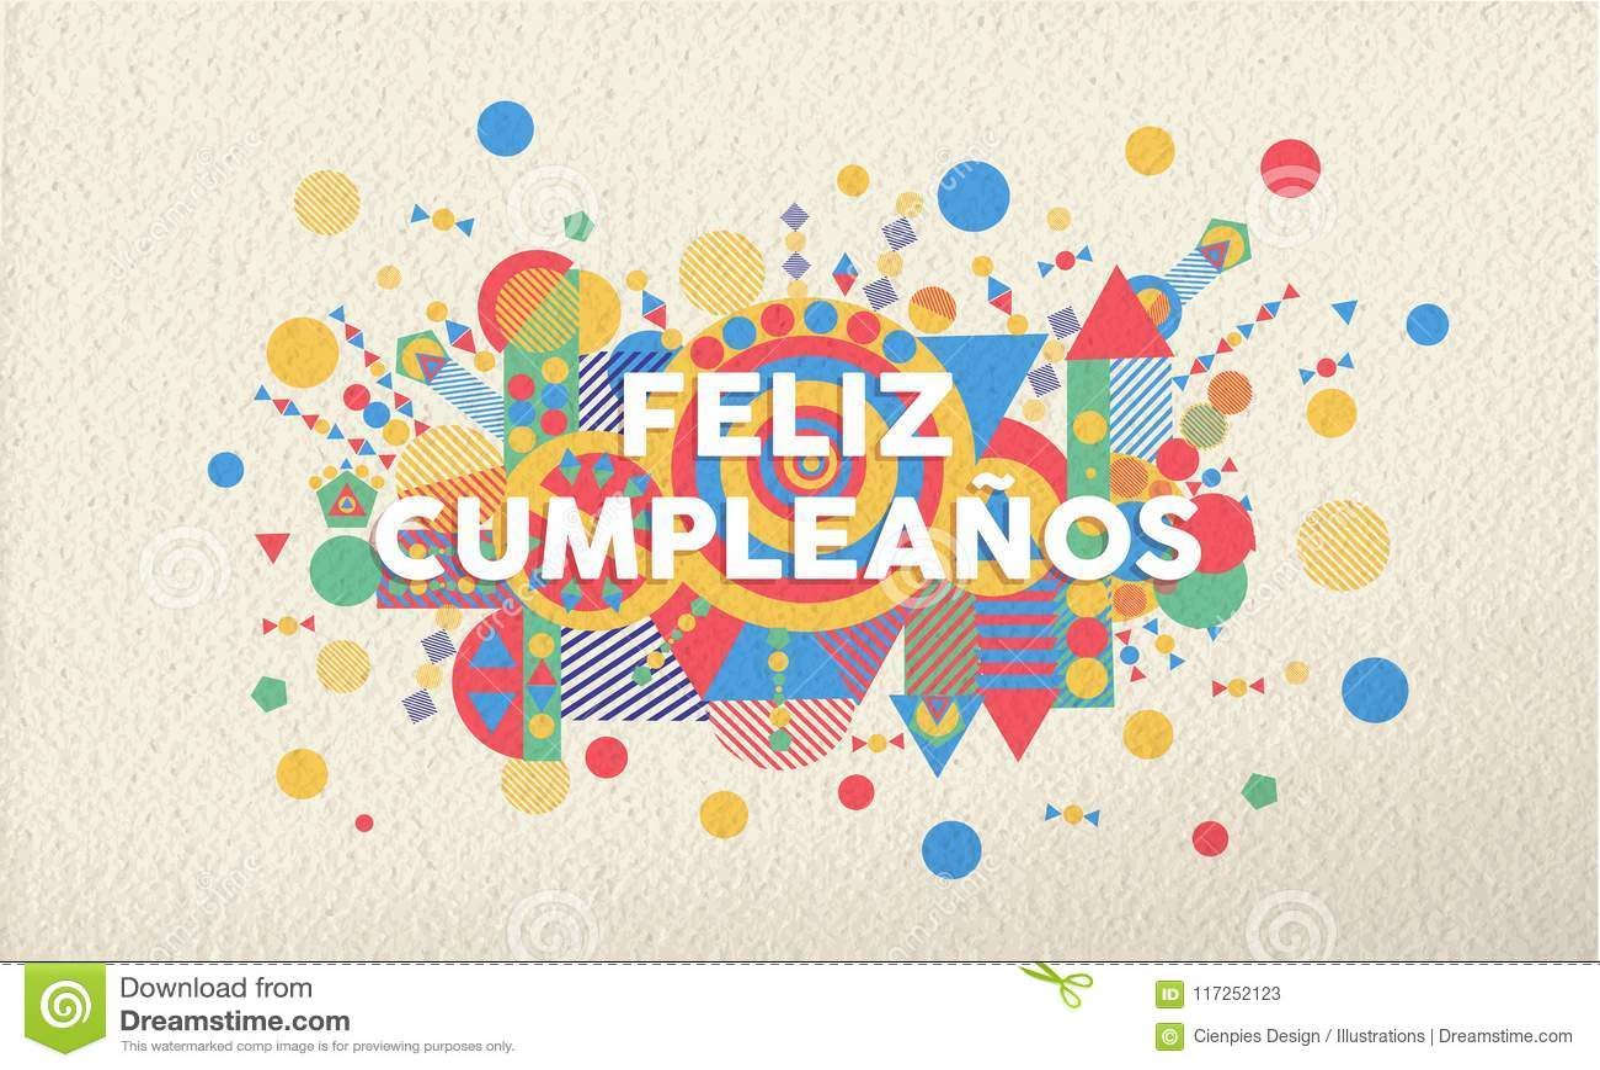 Happy birthday greeting card in spanish language stock vector download happy birthday greeting card in spanish language stock vector illustration of design celebration m4hsunfo